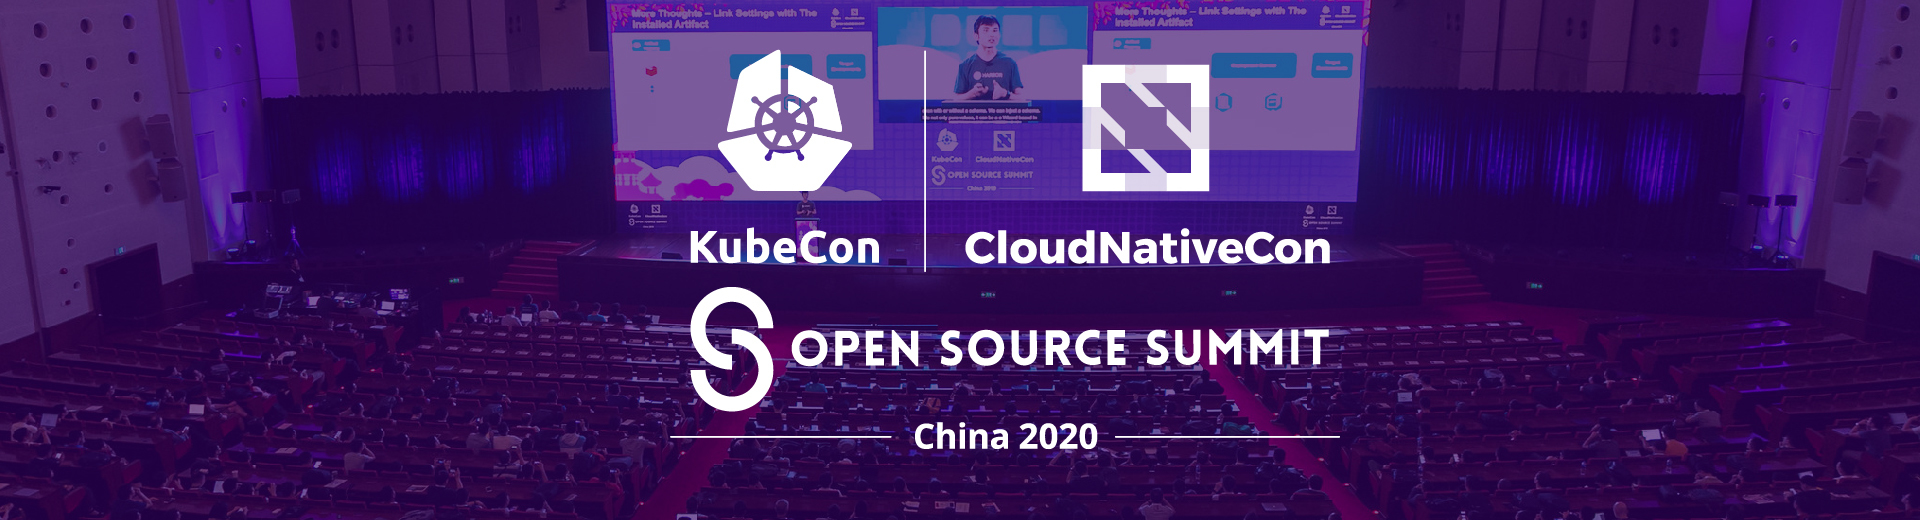 KubeCon + CloudNativeCon + Open Source Summit China 2020